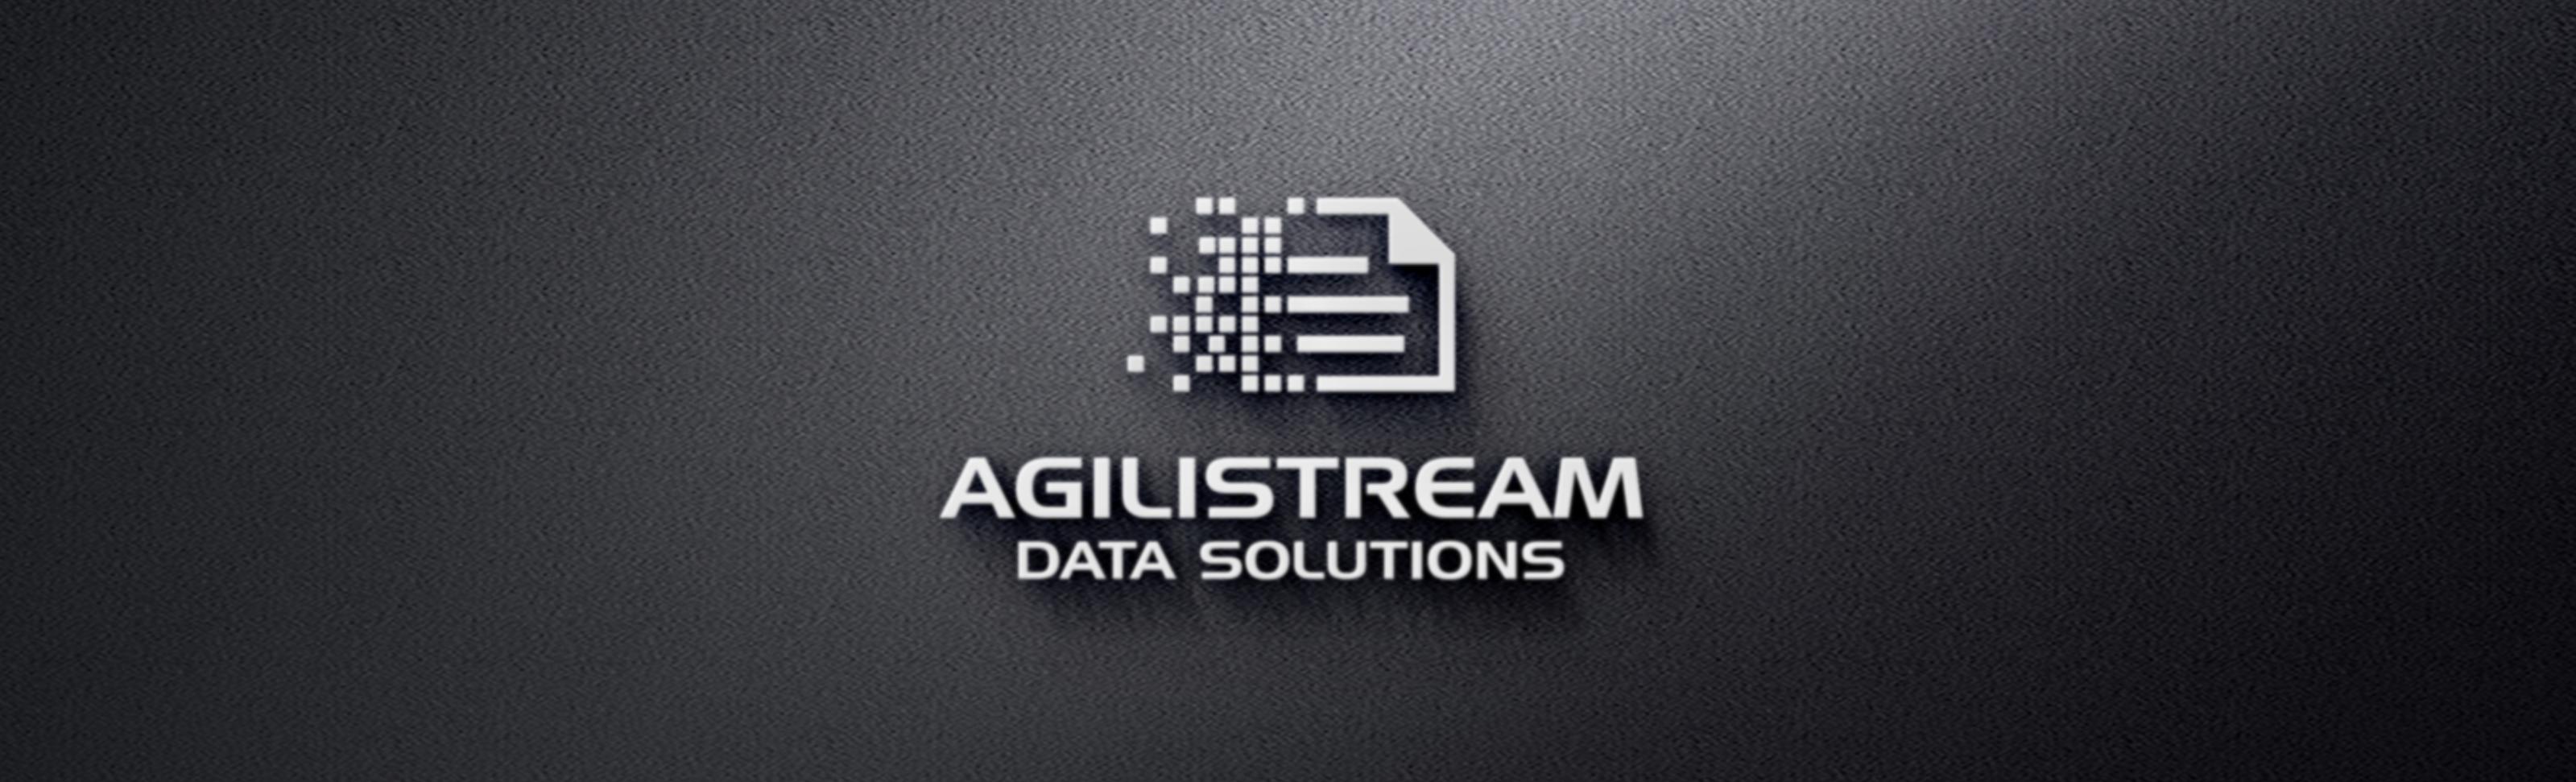 LinkedIn Cover Image for Agilistream Data Solutions, LLC